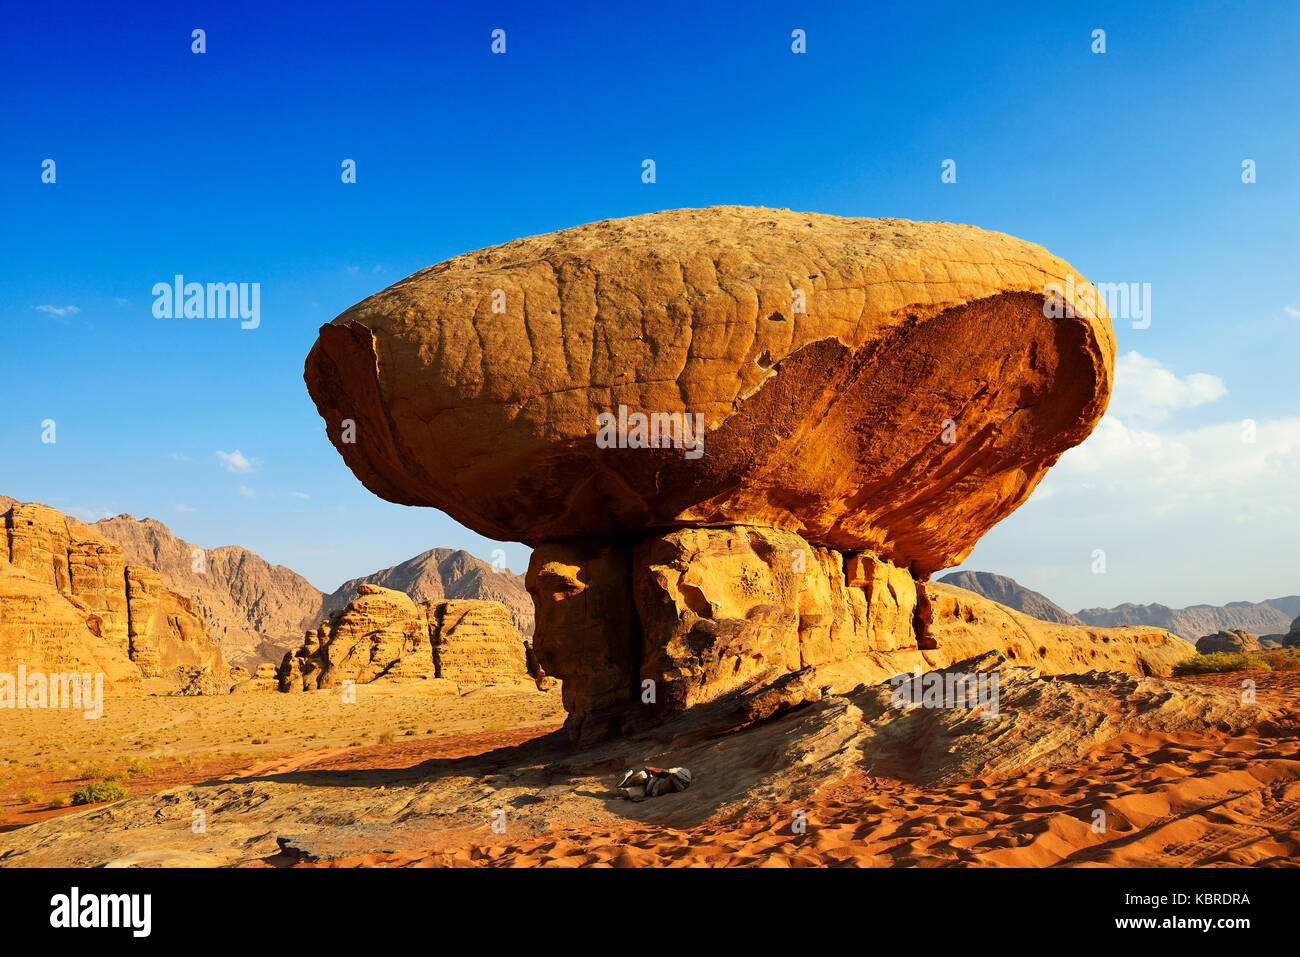 Seta-rock, al fetra, Wadi Rum, Jordania Imagen De Stock